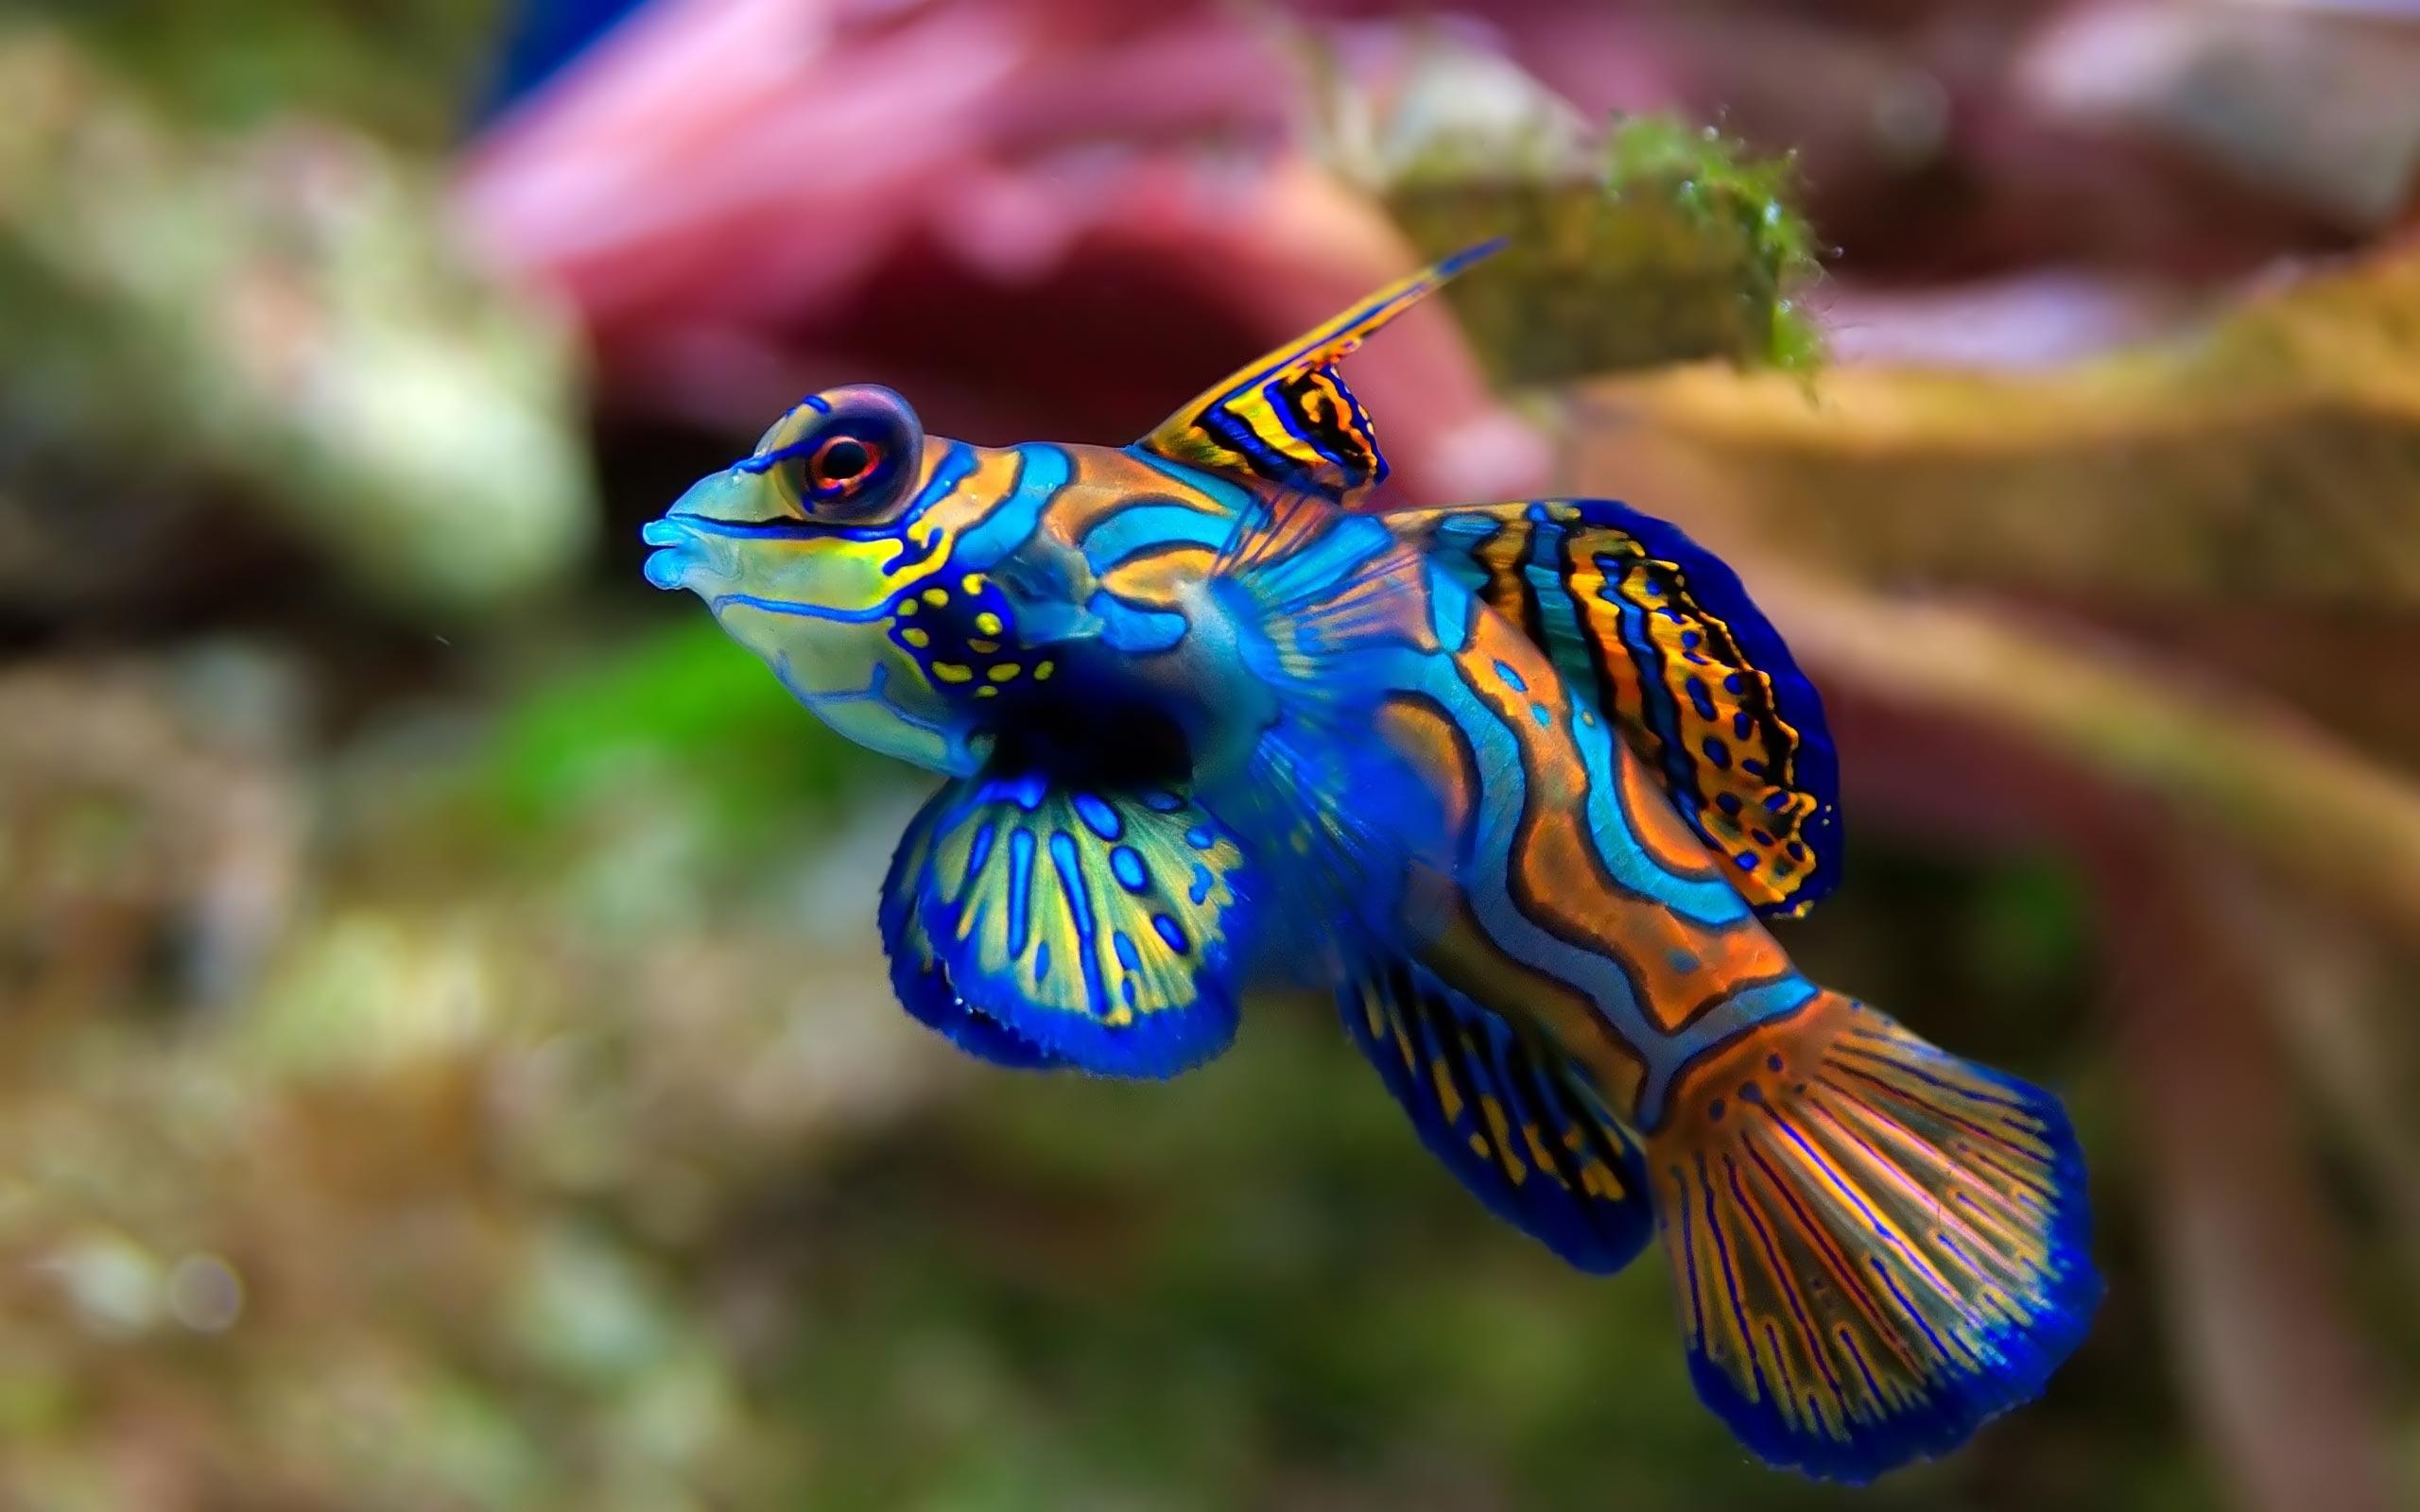 fish saltwater aquarium Wallpaper High Quality WallpapersWallpaper 2560x1600